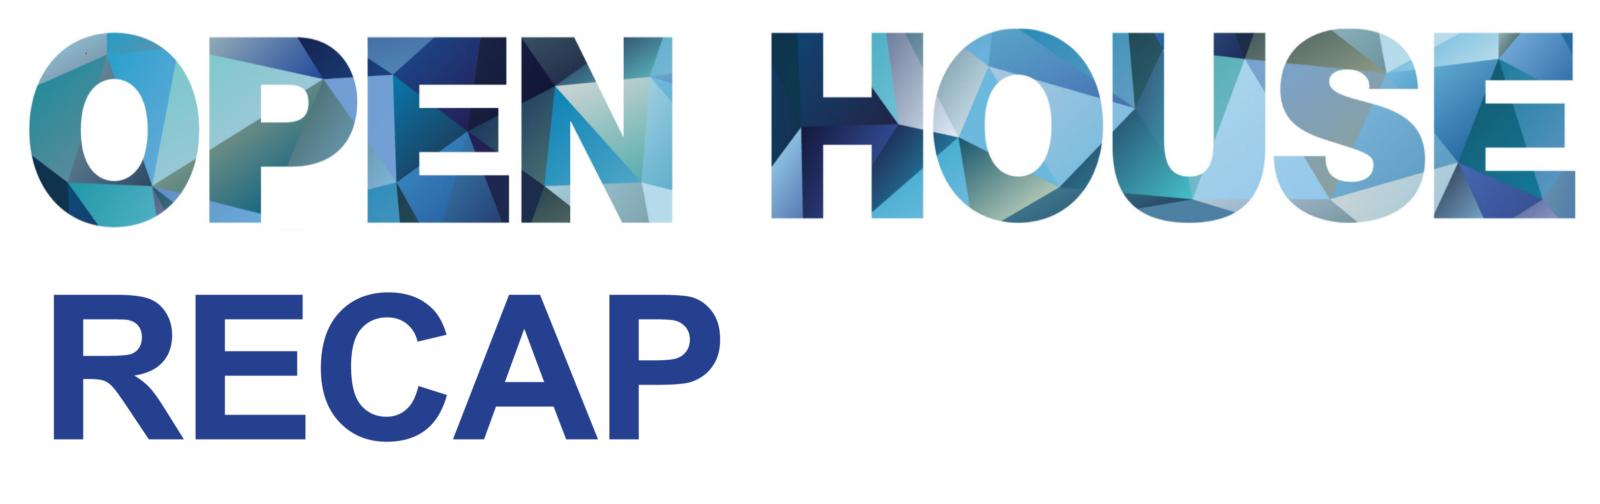 Open House Recap